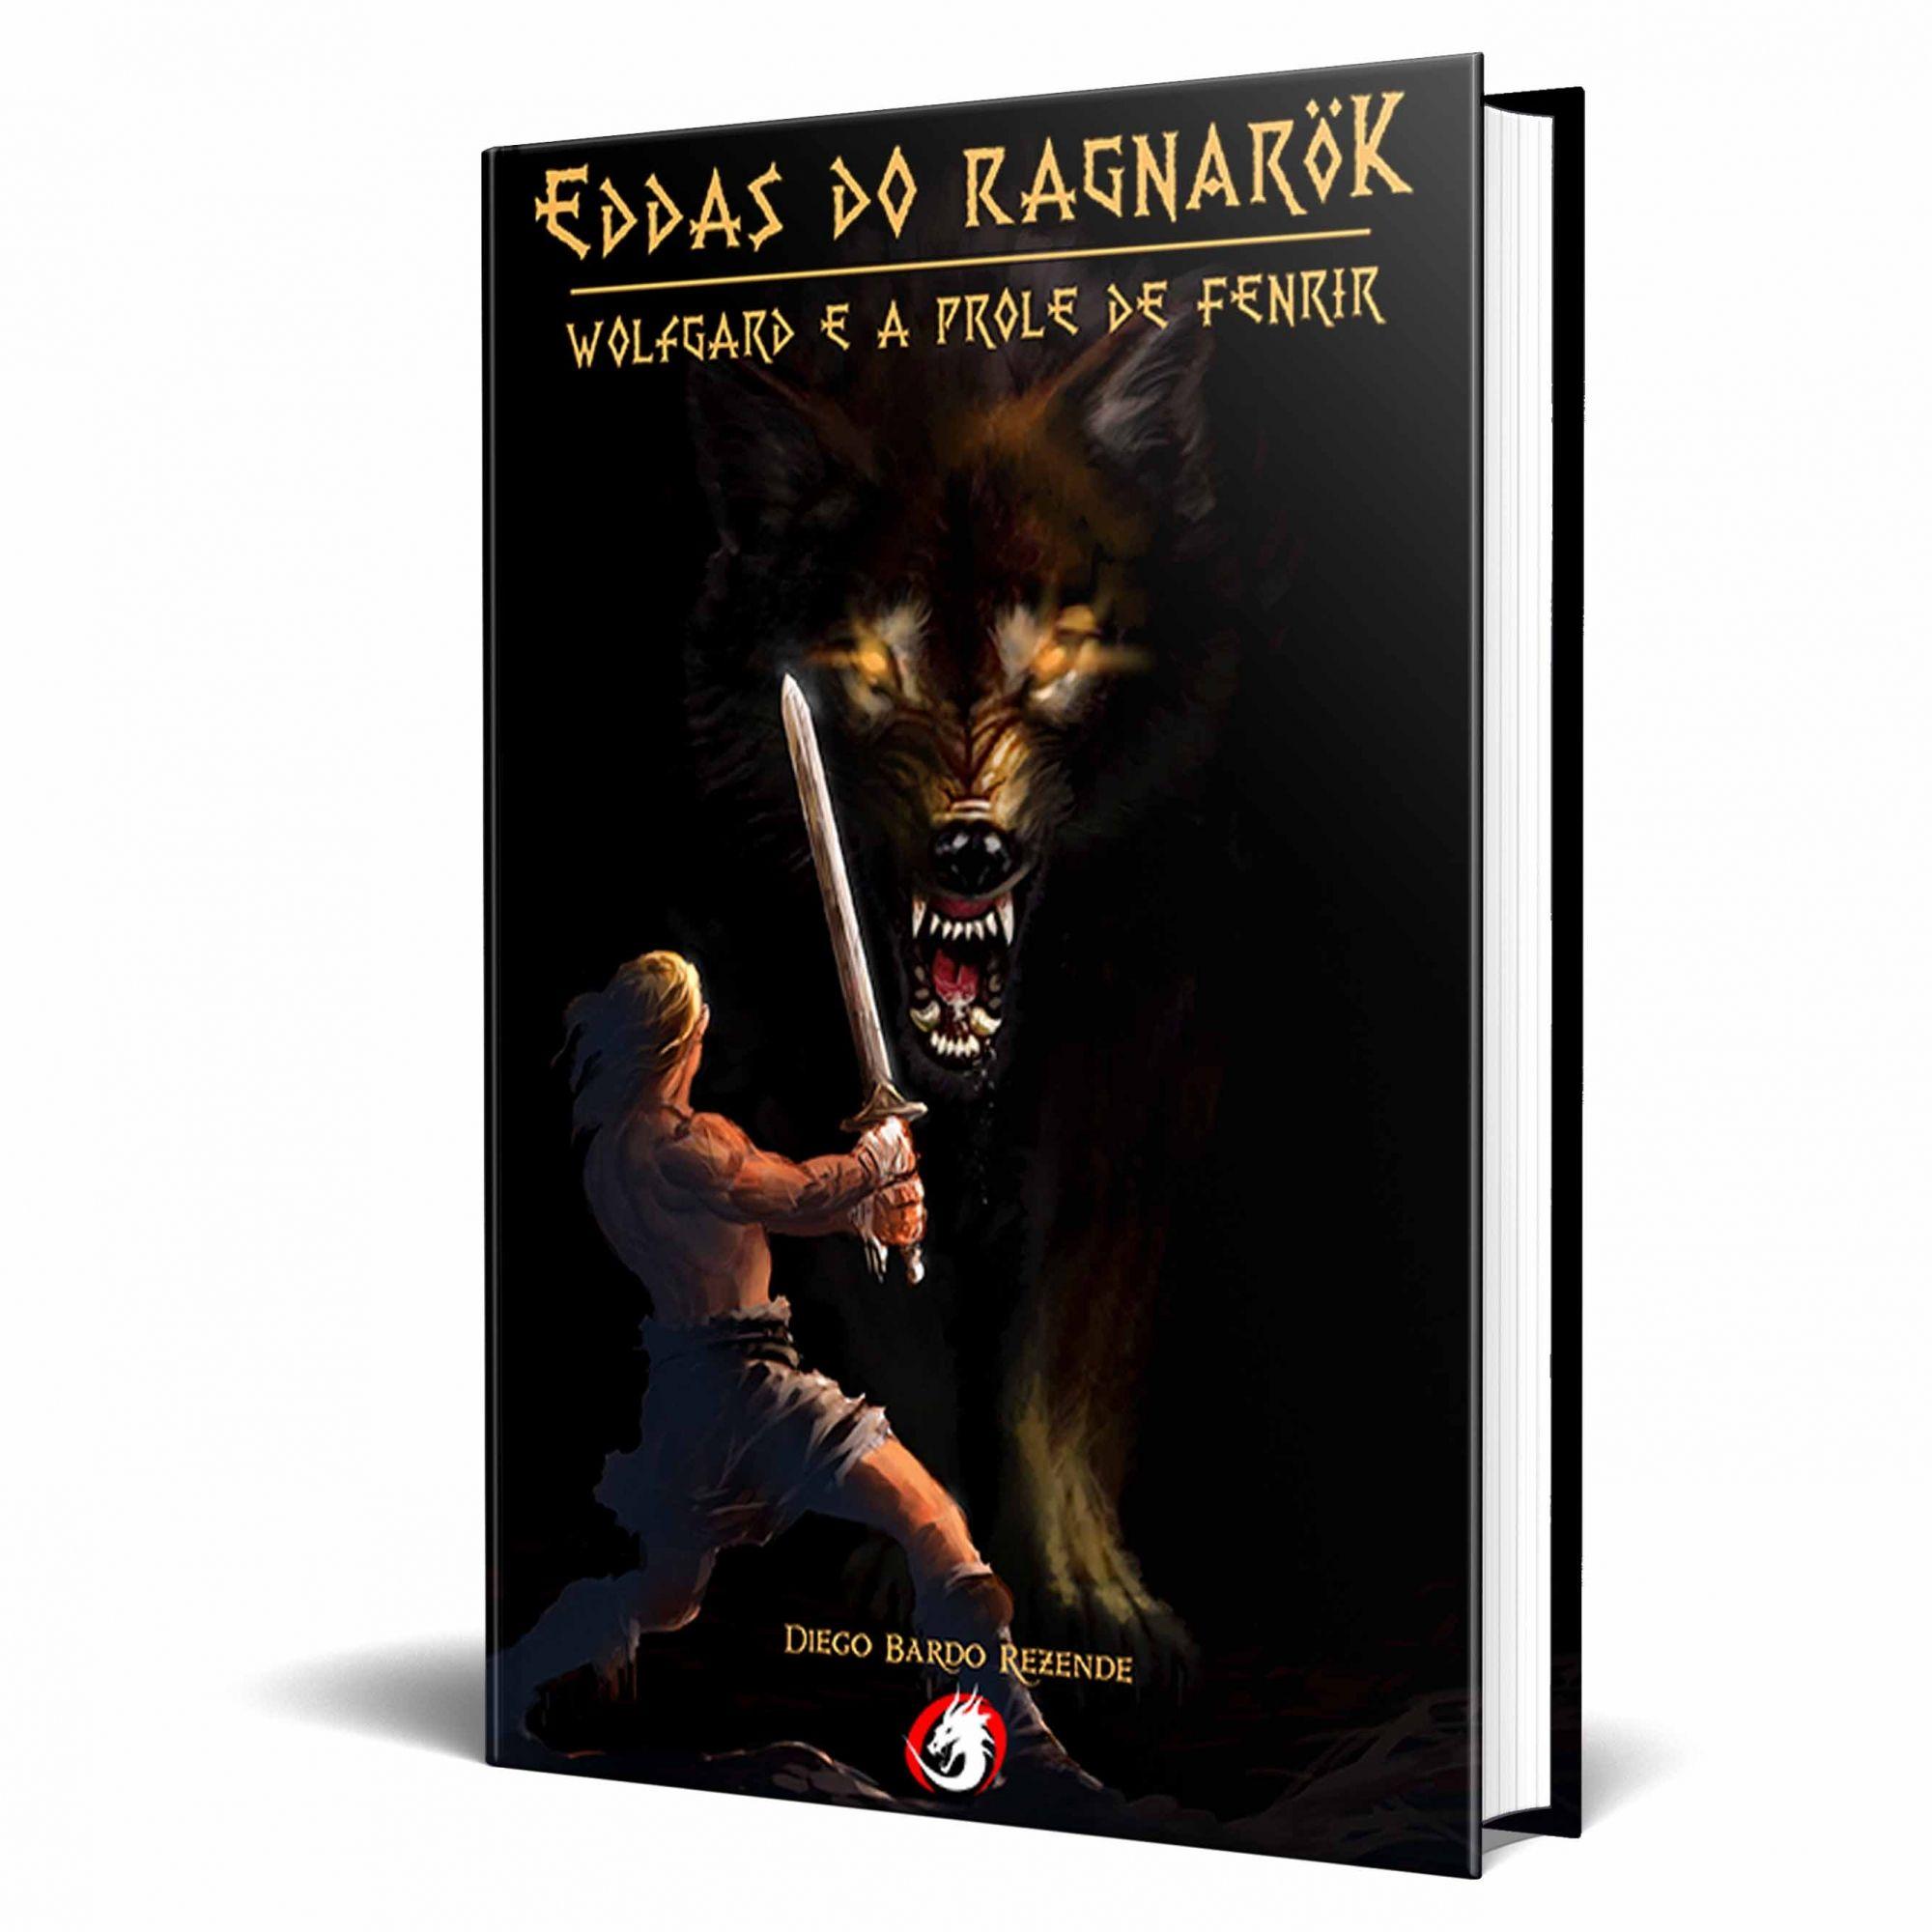 Livro Eddas do Ragnarök